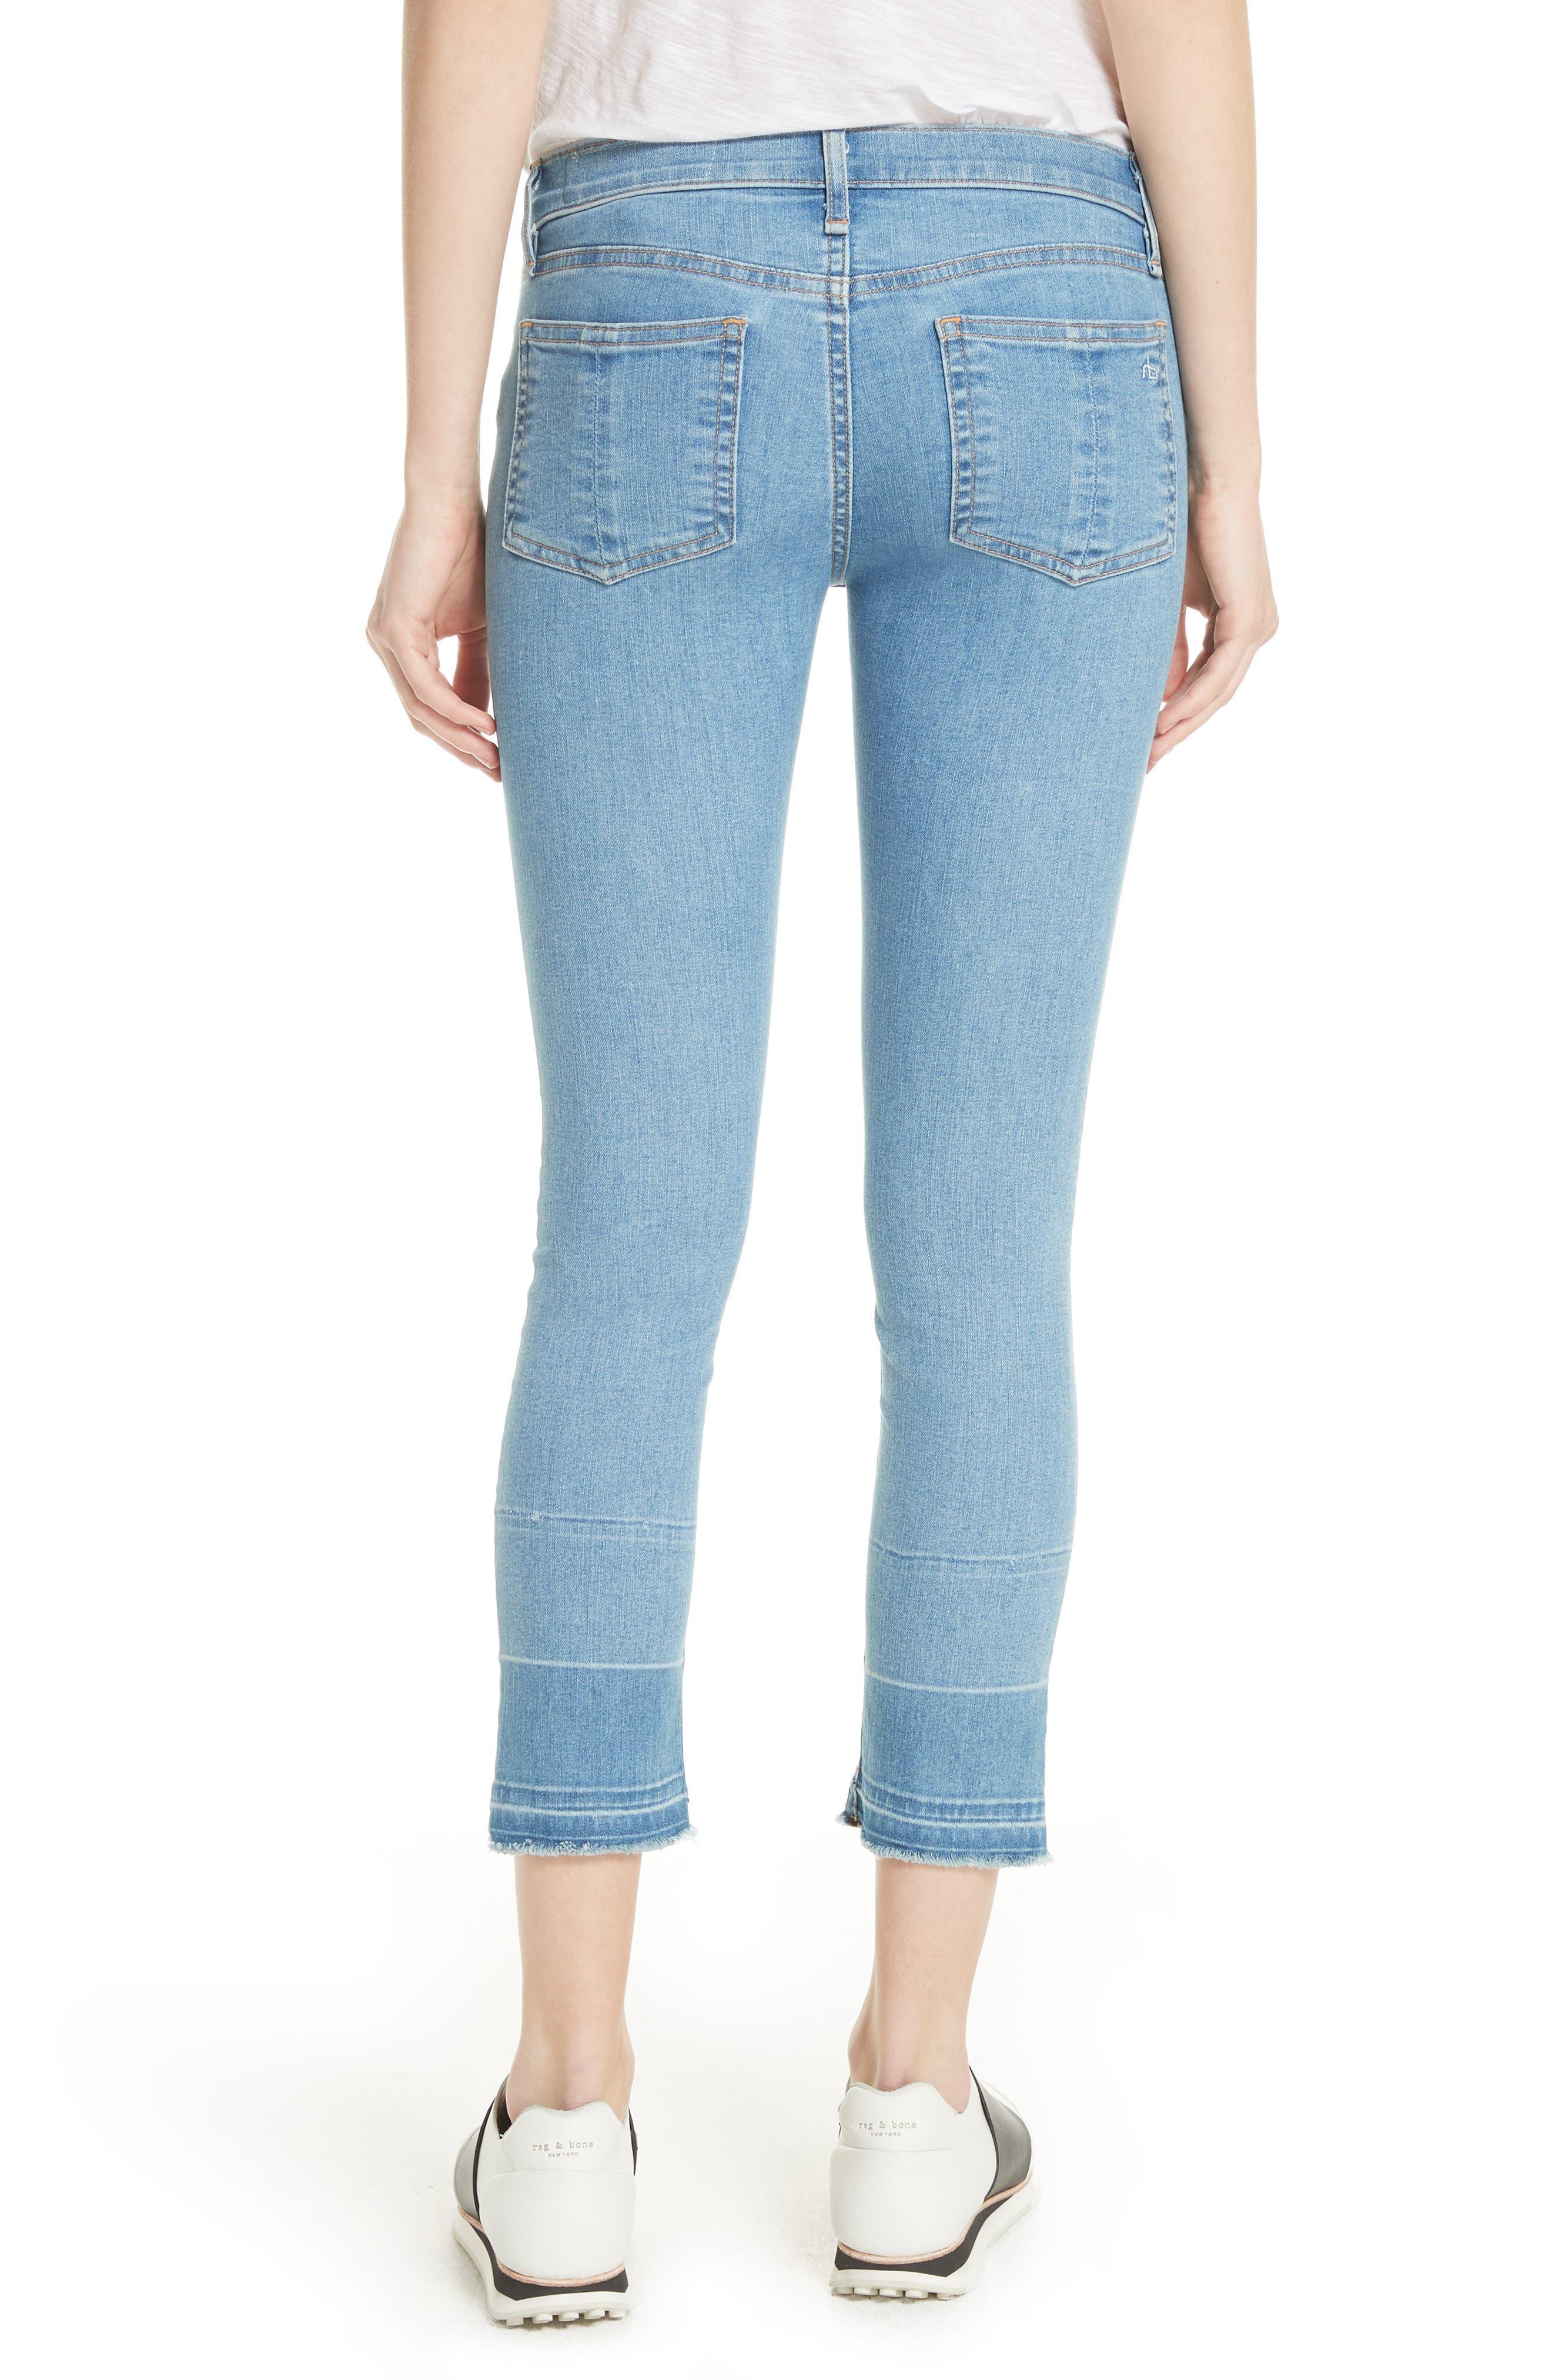 JEAN Release Hem Ankle Skinny Jeans,                             Alternate thumbnail 2, color,                             409